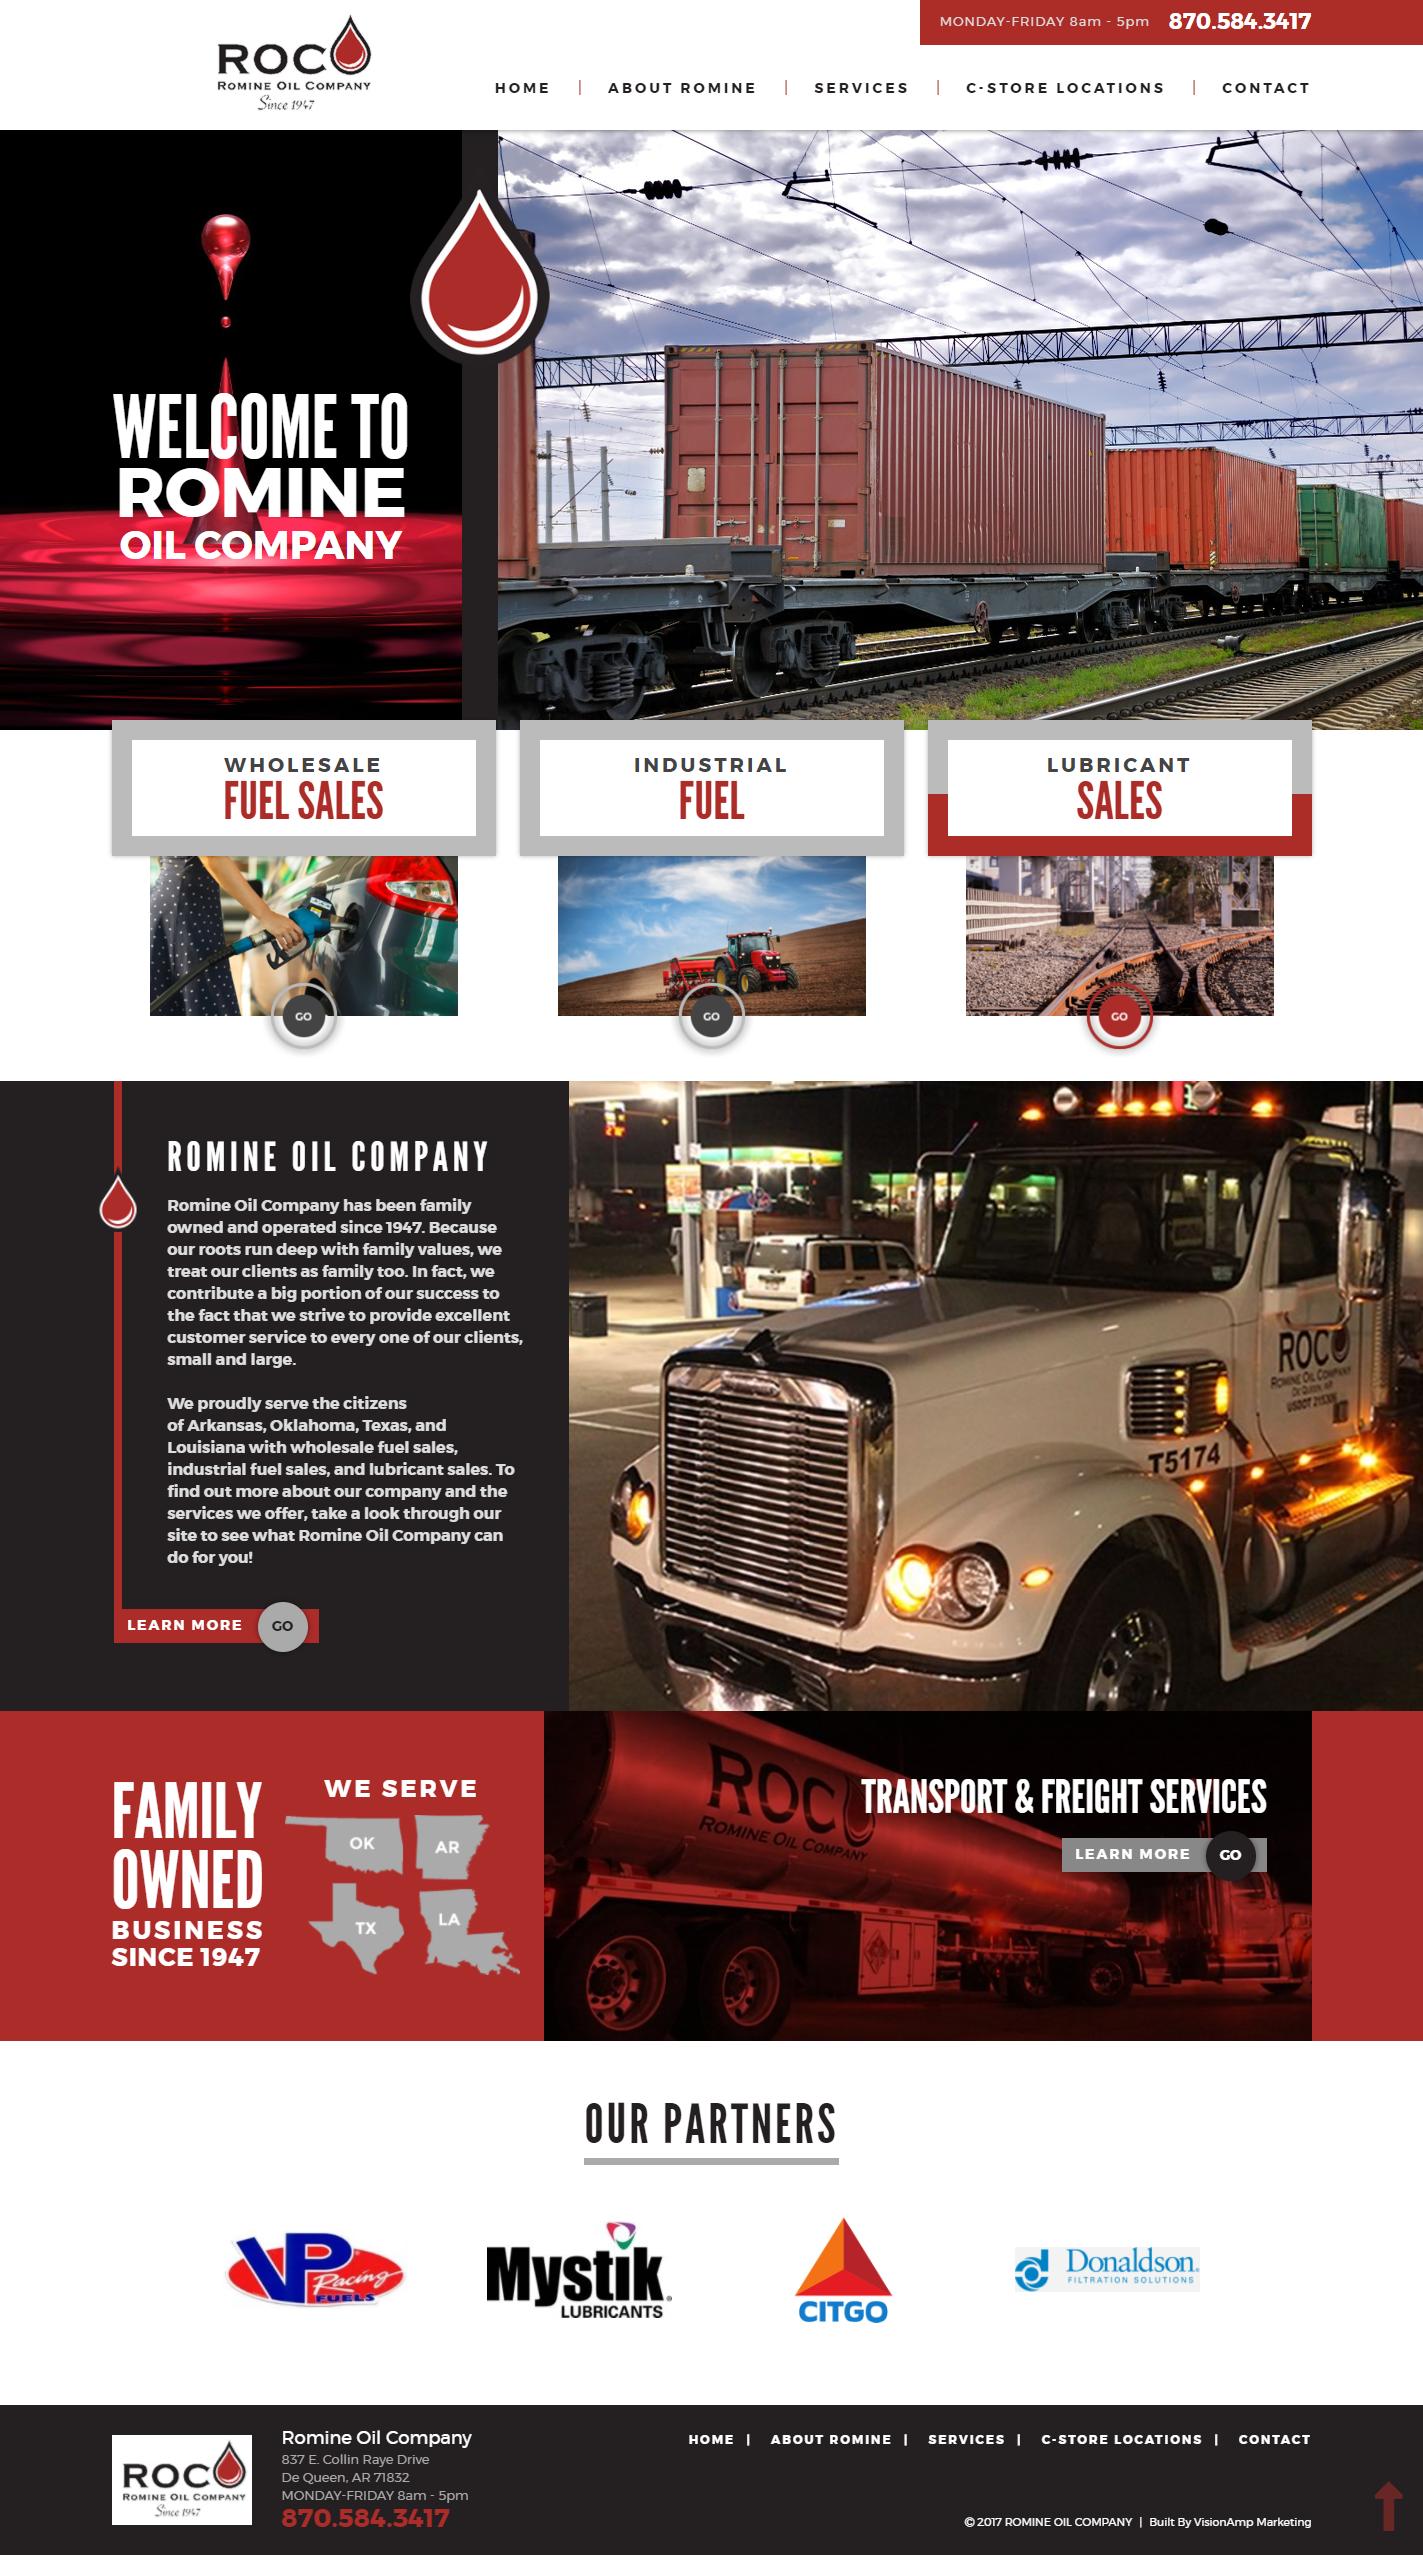 Romine Oil Company Full Web Design Image